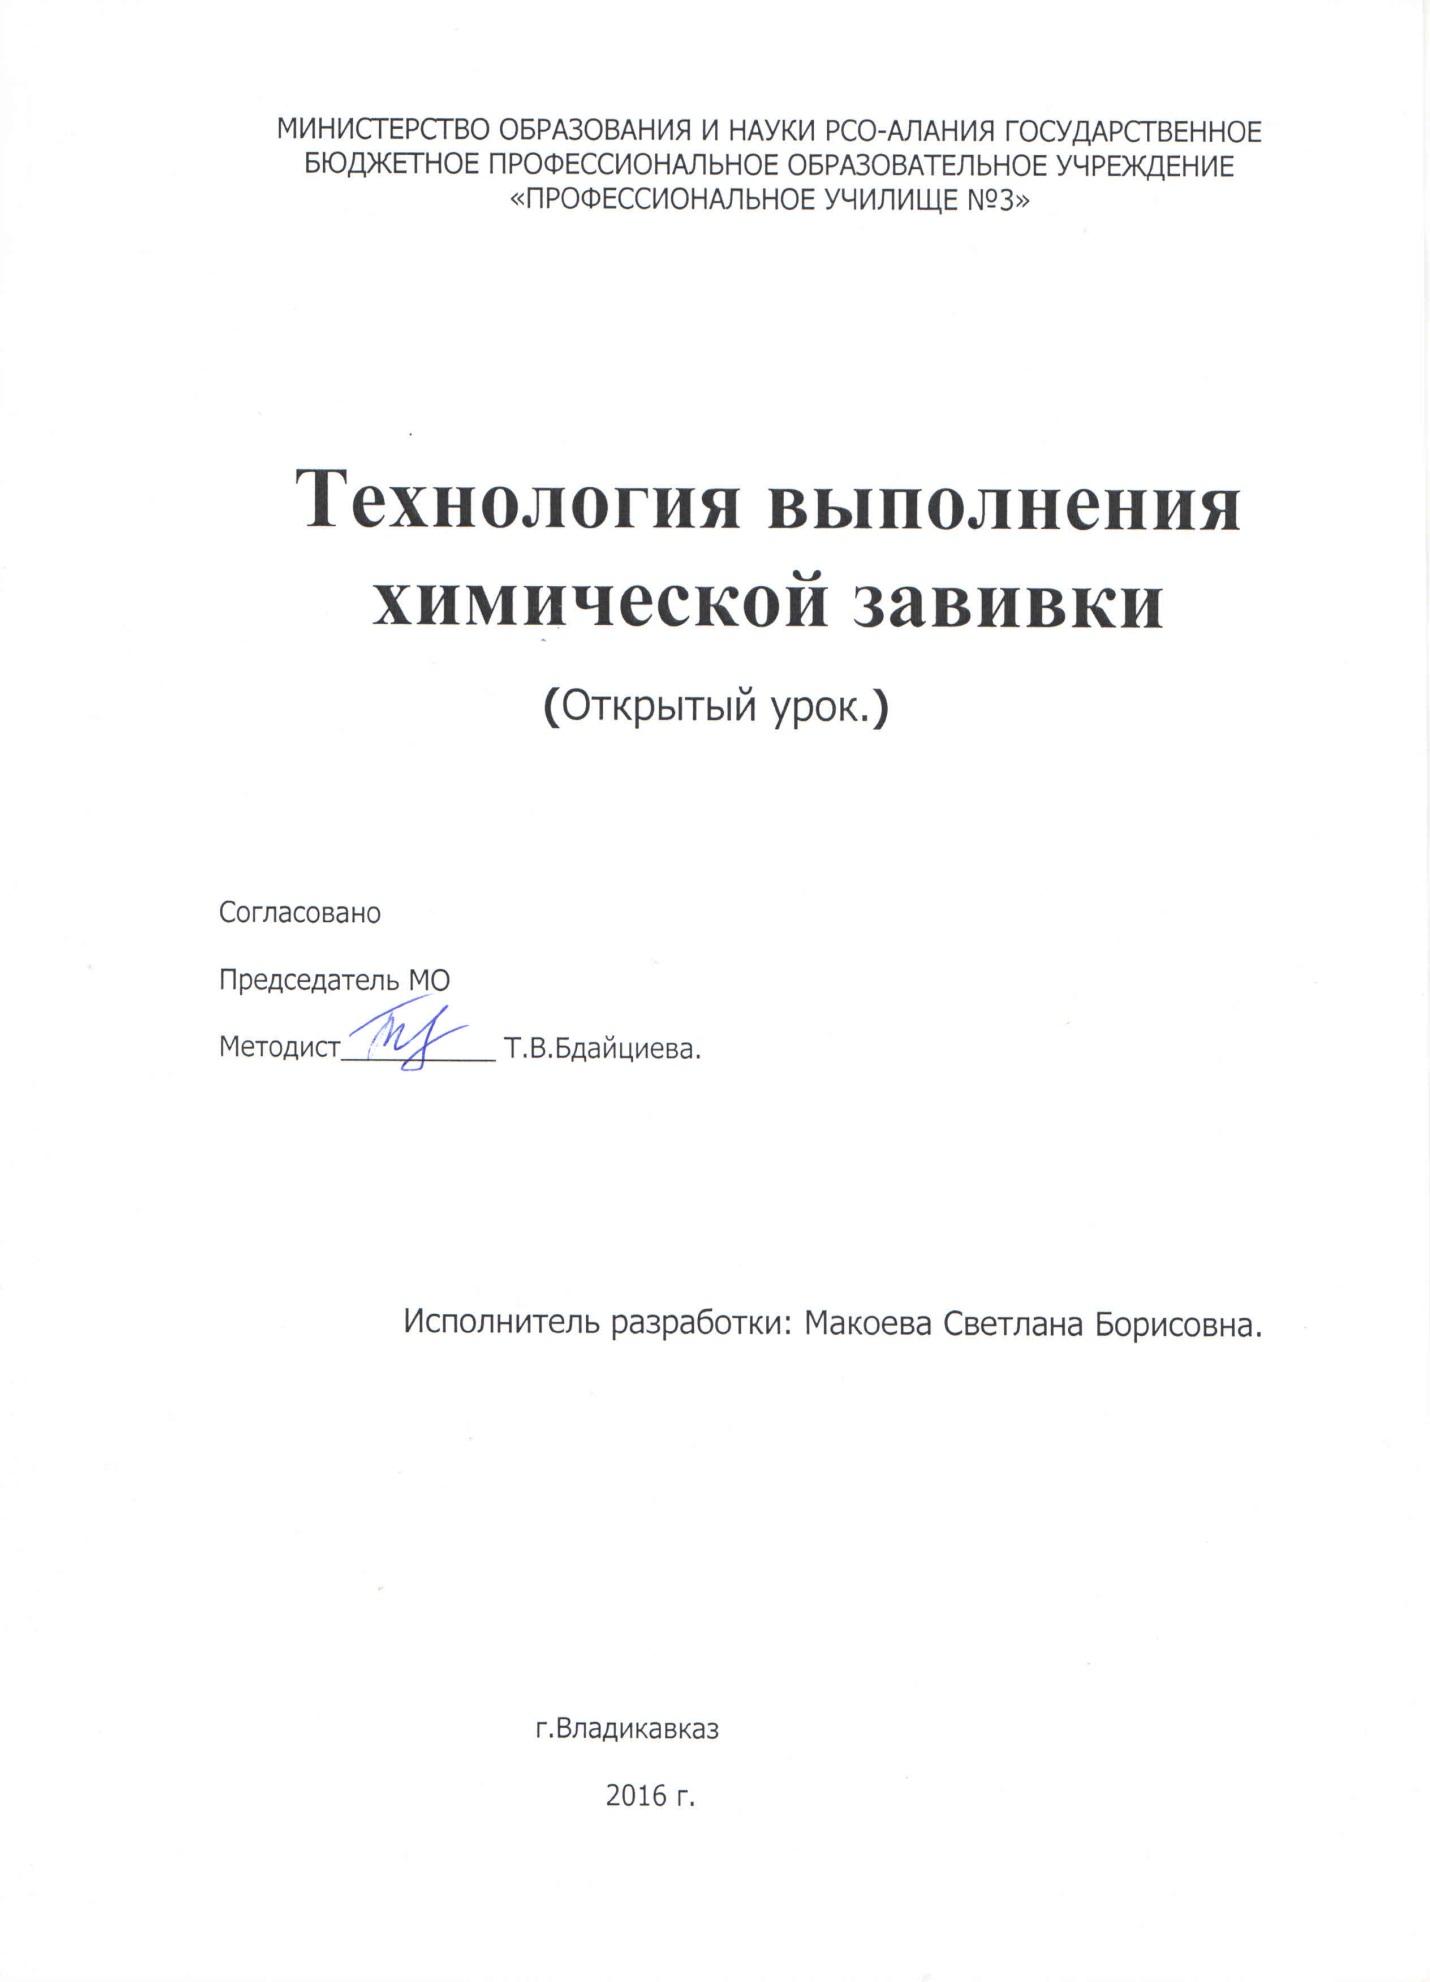 C:\Users\АМИНАТ\Documents\Документы сканера\Откр.ур.2.jpg